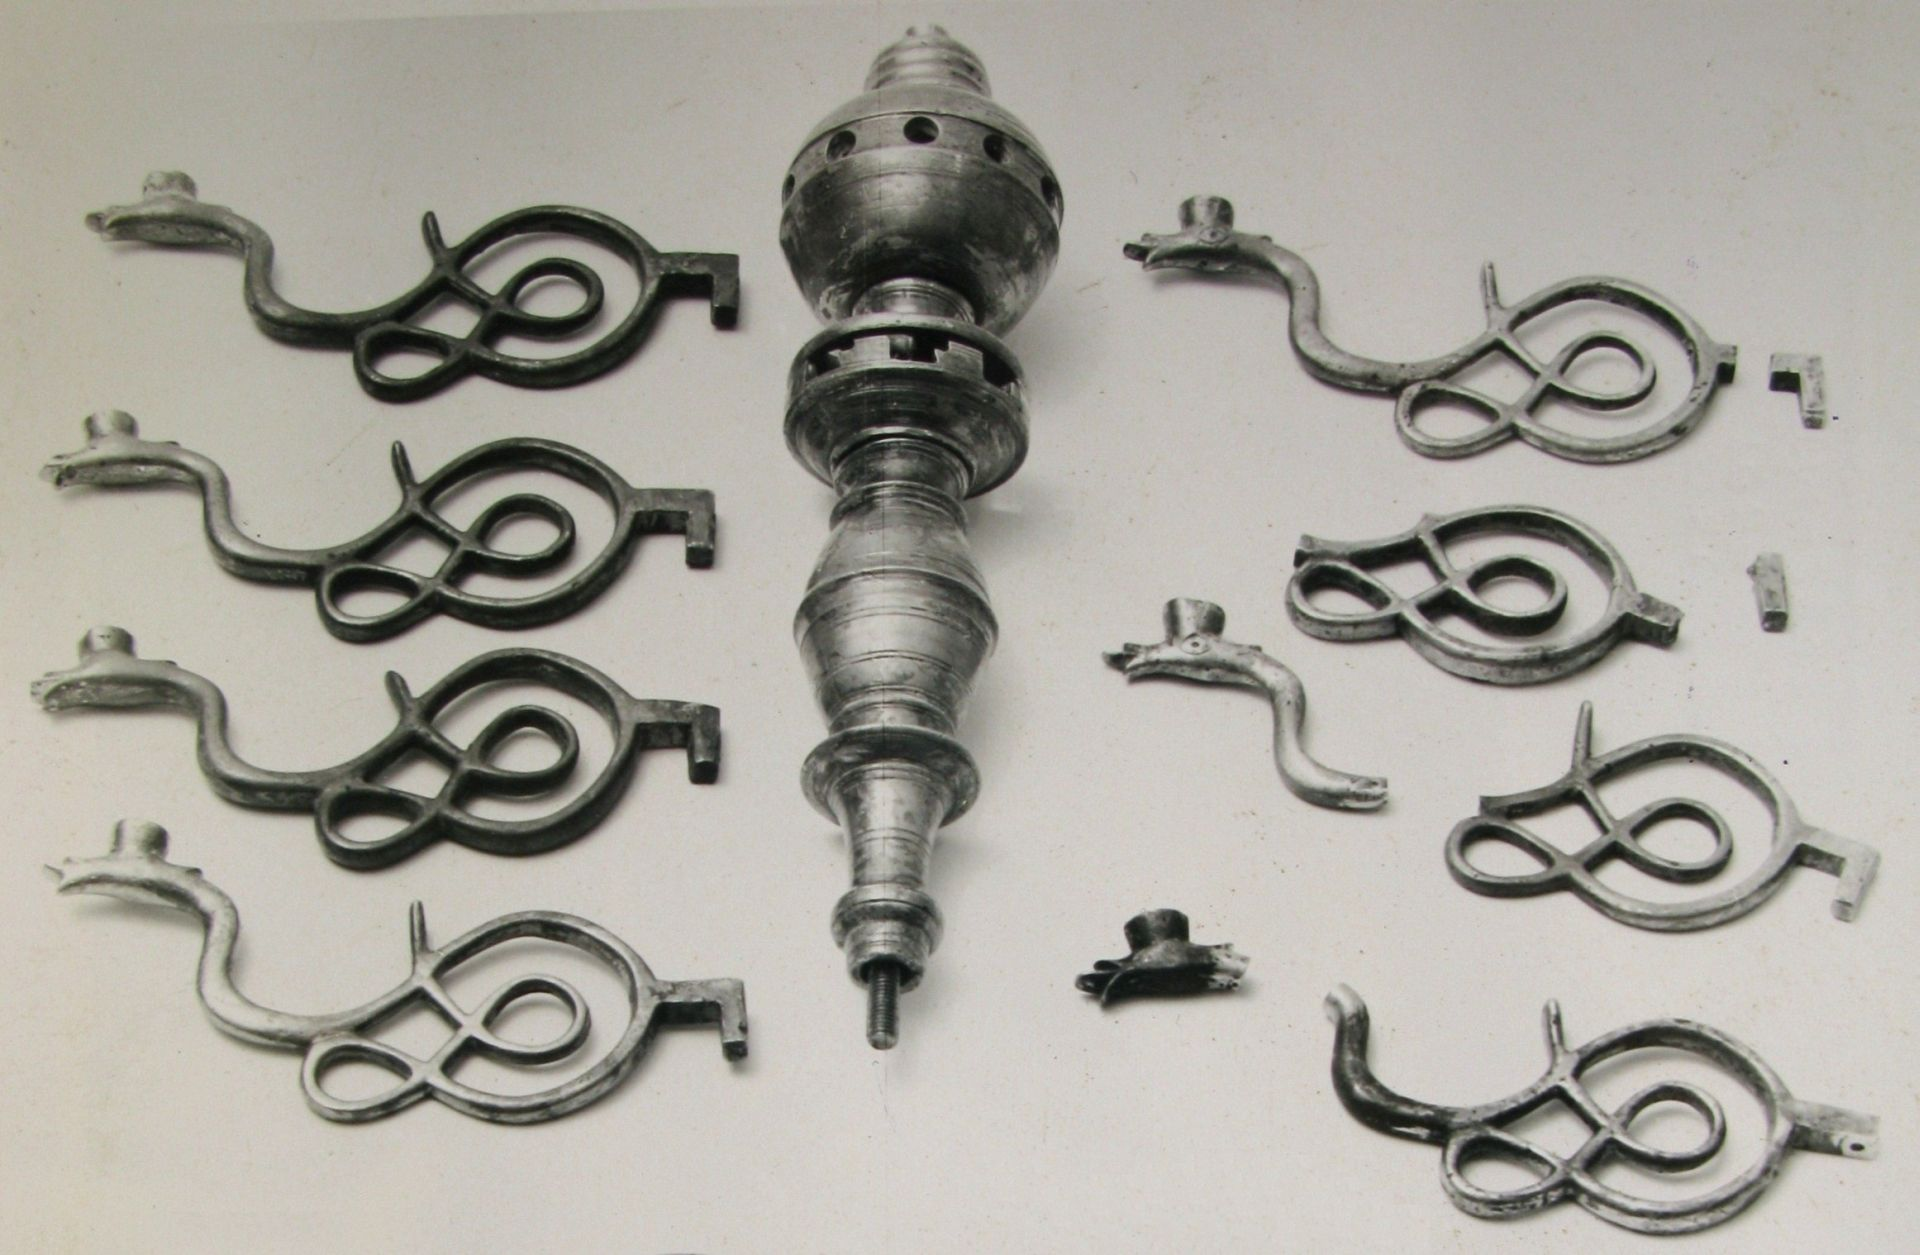 Parts of the chandelier before restoration, 1600–1699, Lithuanian Art Museum, TM-2332. Photo by Aleksandras Sidorenka, 1984, in: Lietuvos dailės muziejaus Prano Gudyno restauravimo centras